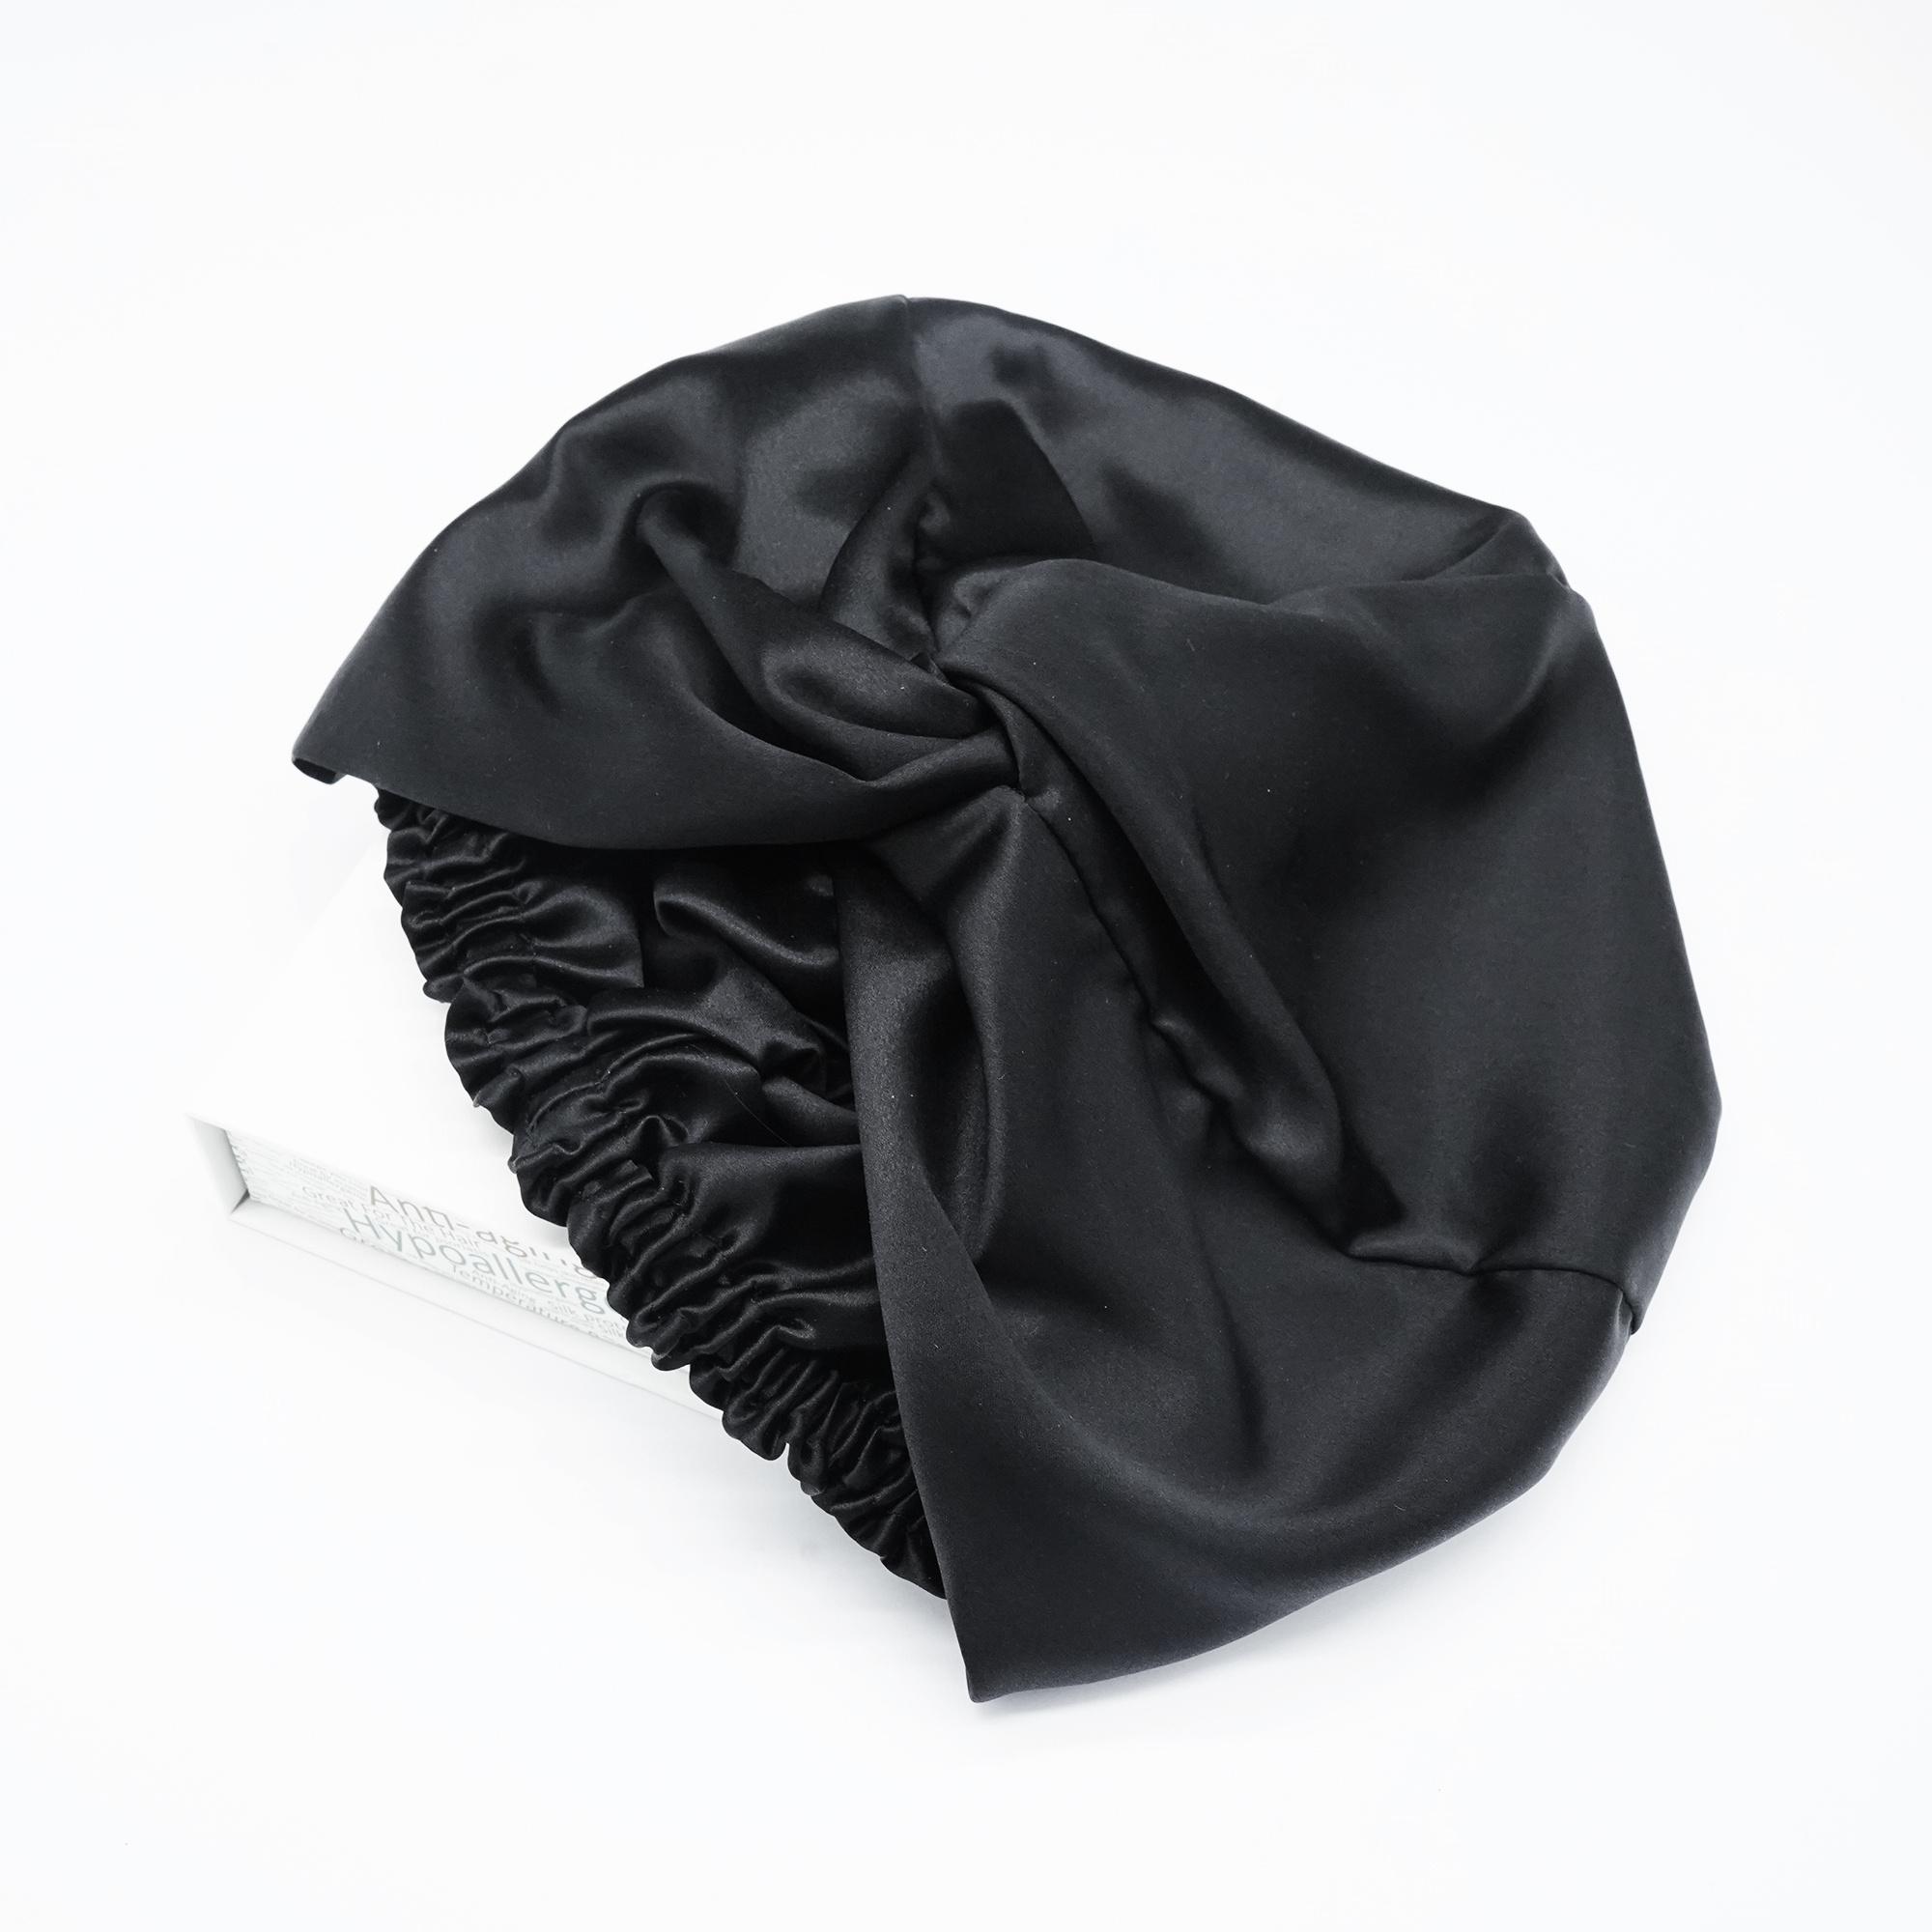 Silk Bonnet for Sleeping